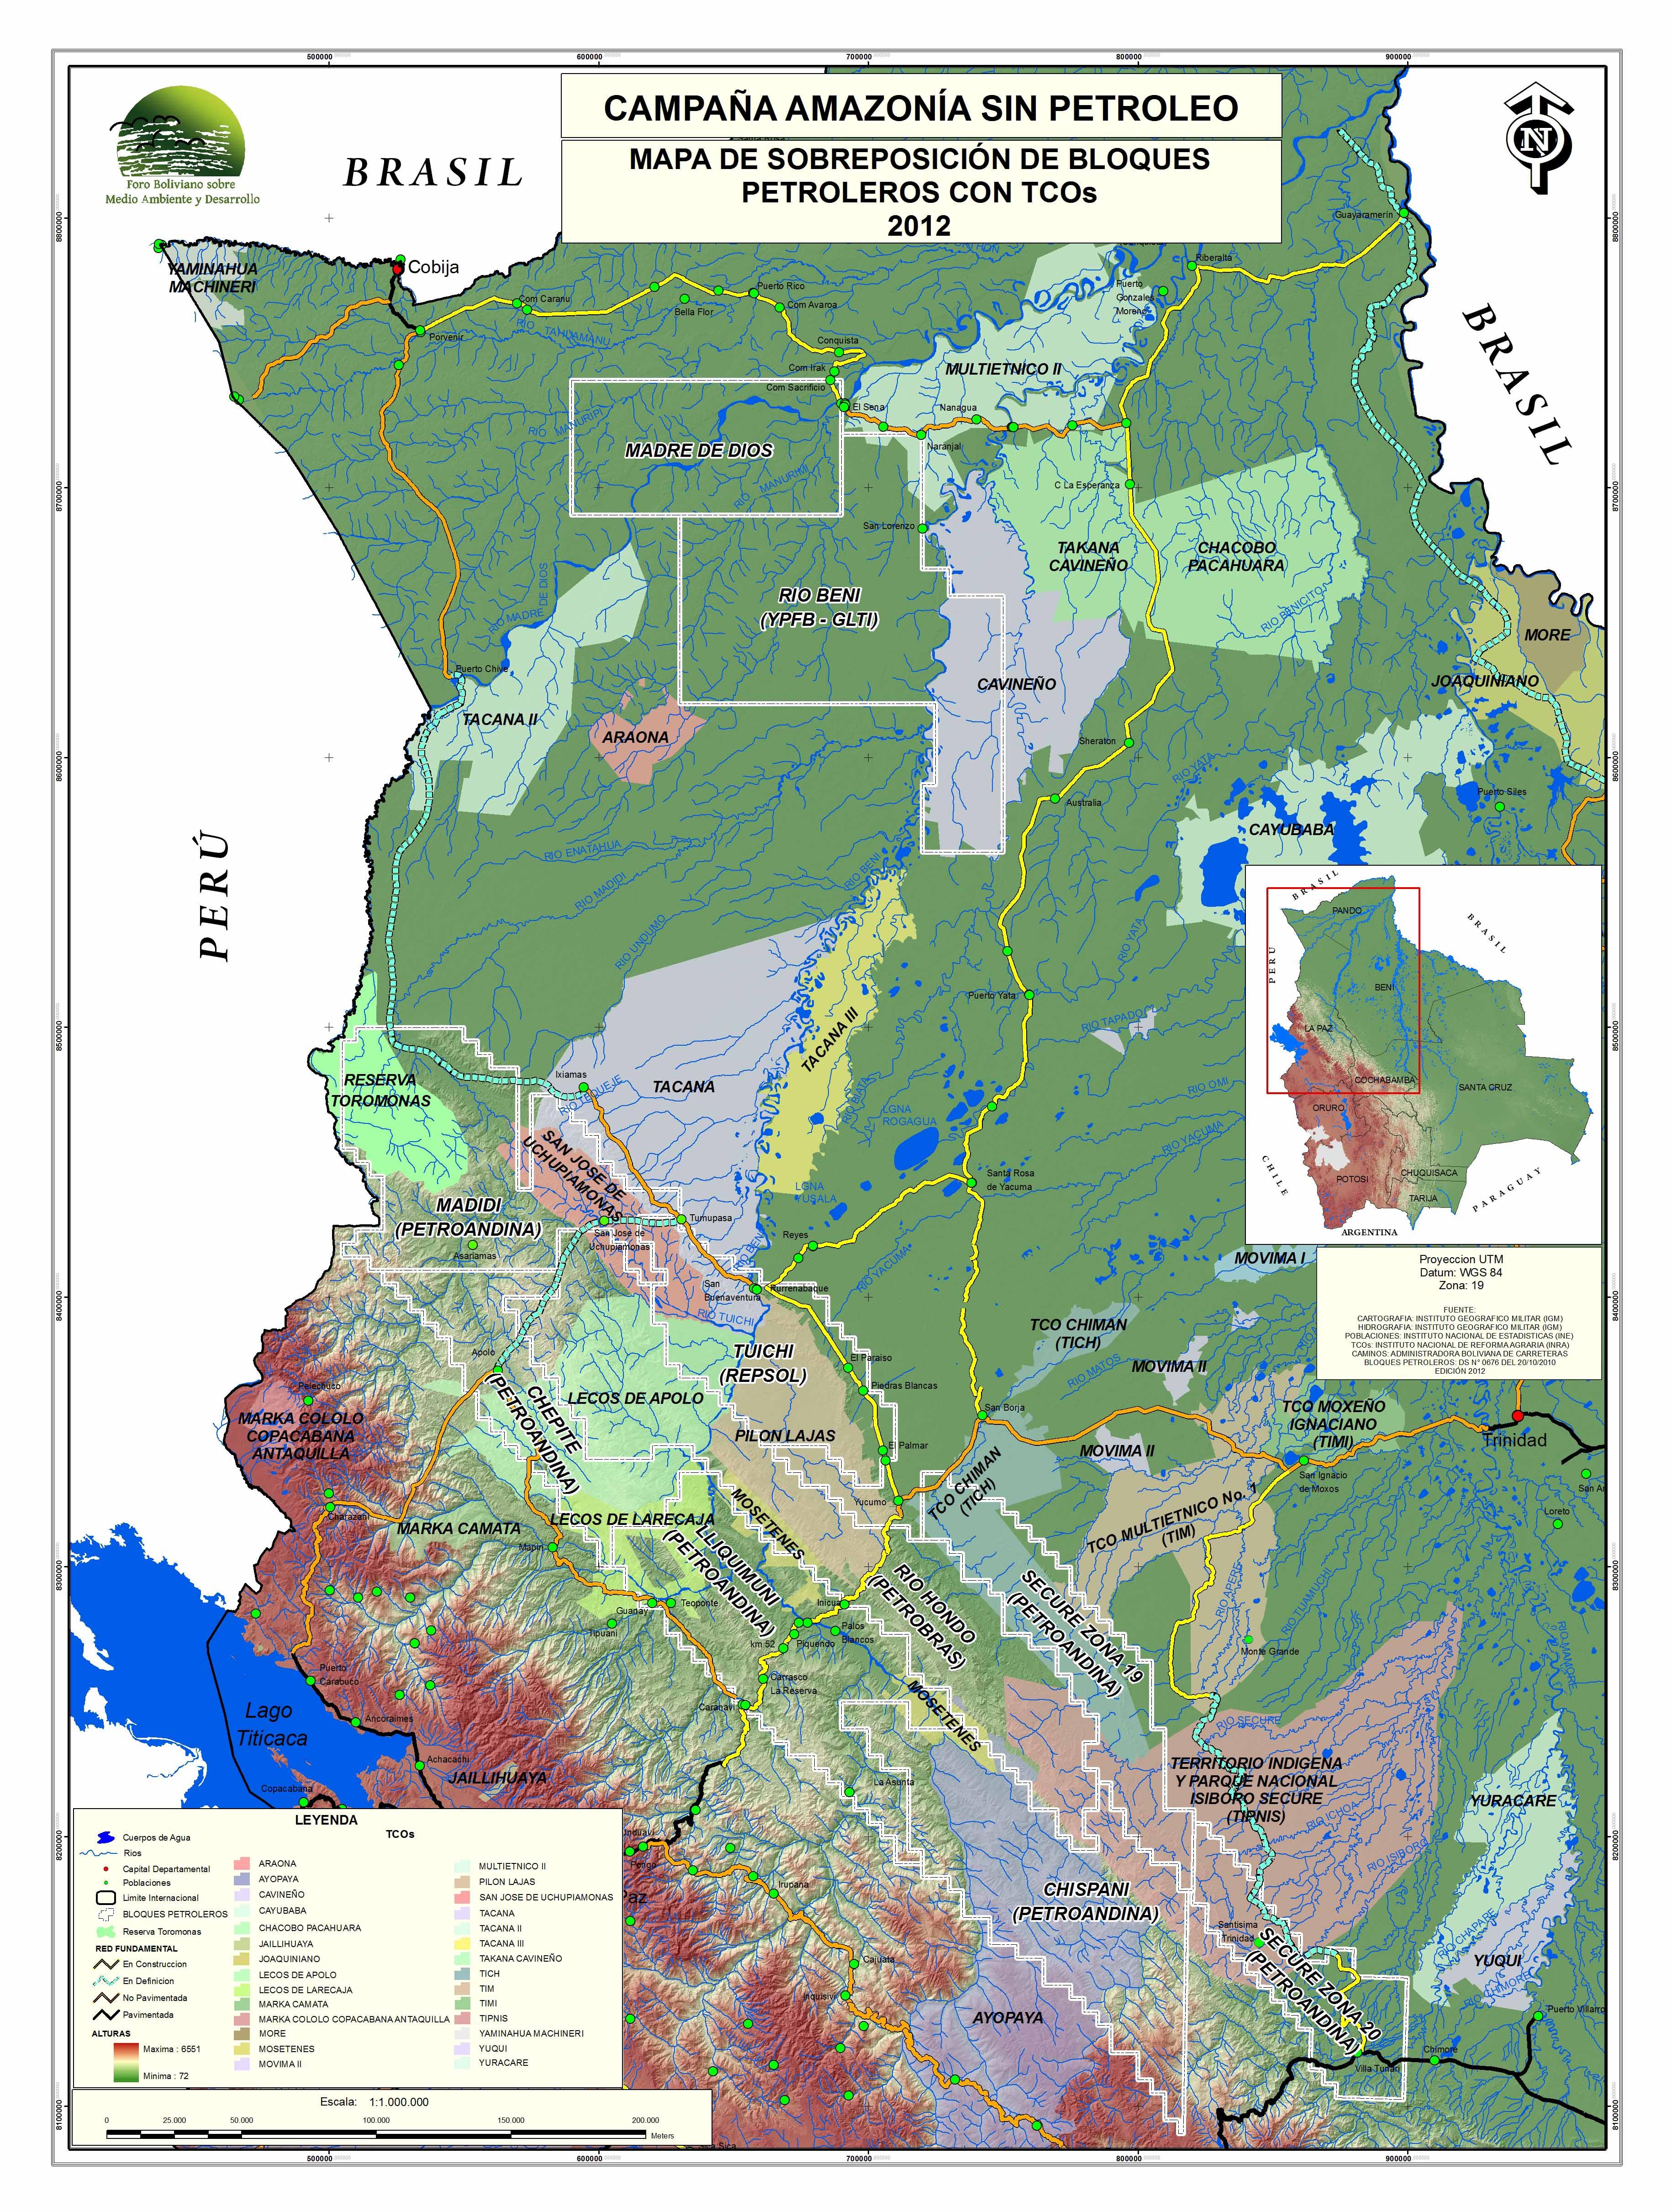 Campaña Amazonía sin Petroleo: Mapa de sobreposición de bloques petroleros con TCOs